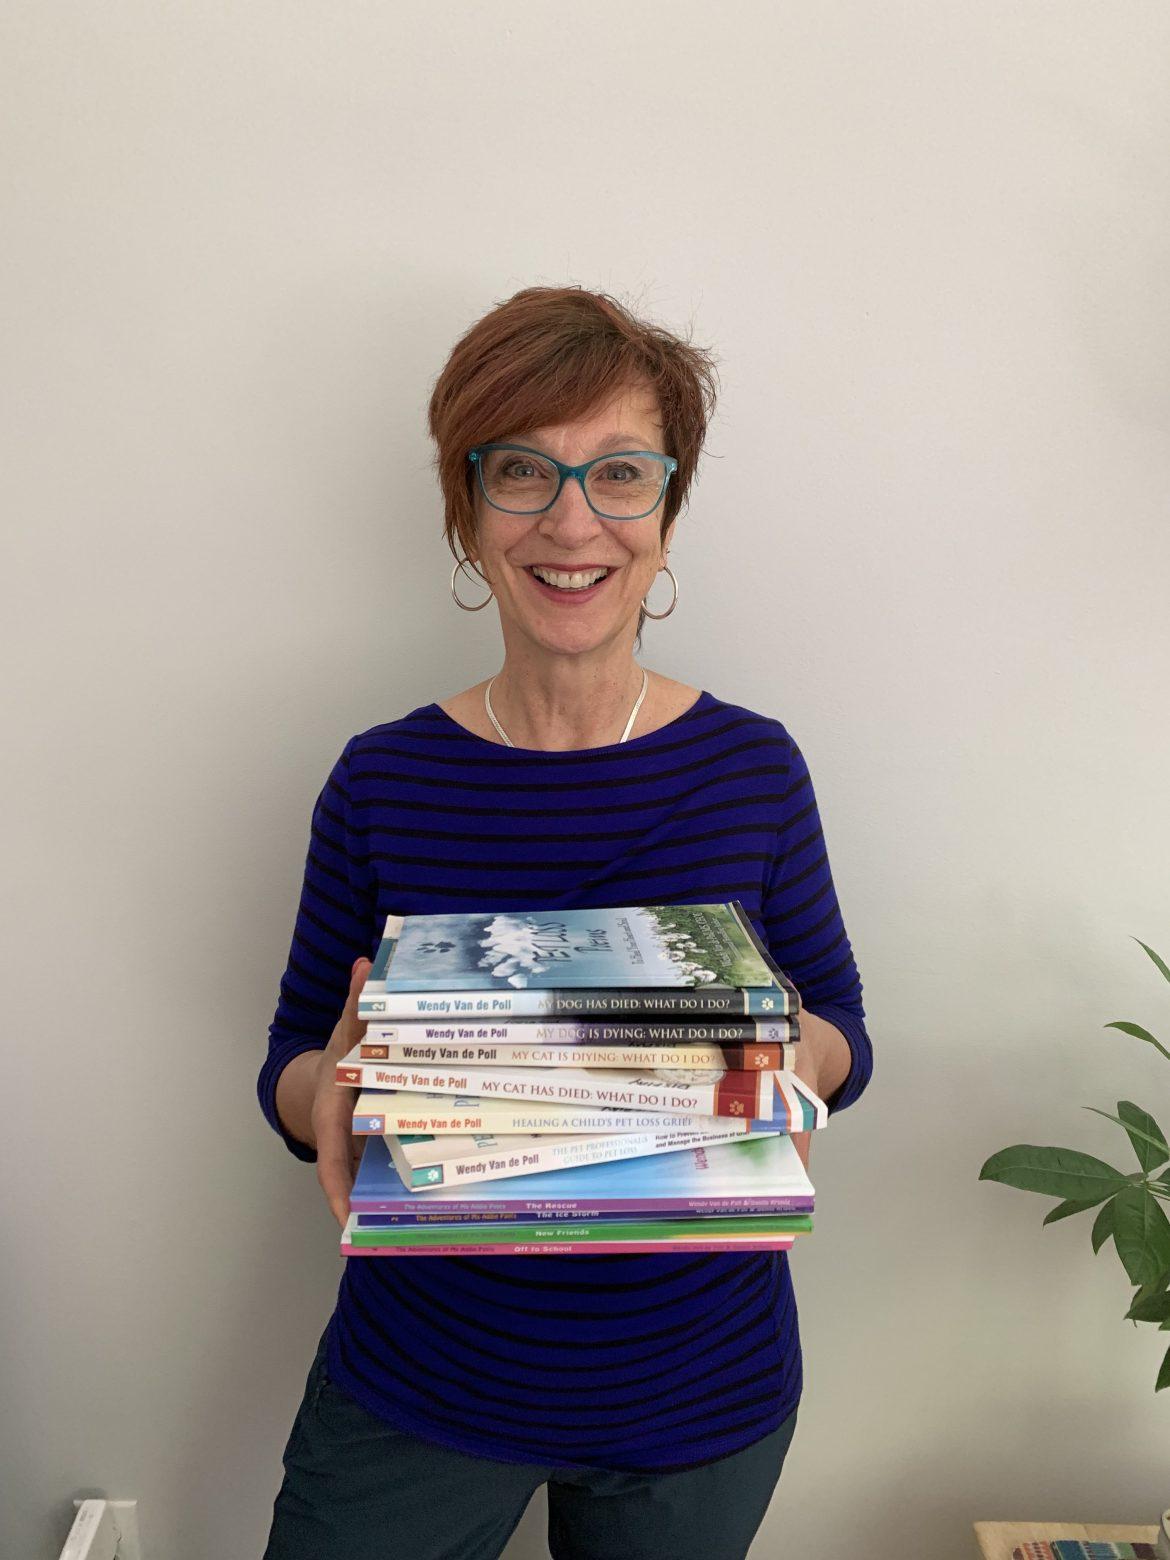 All My Books, Wendy Van de Poll